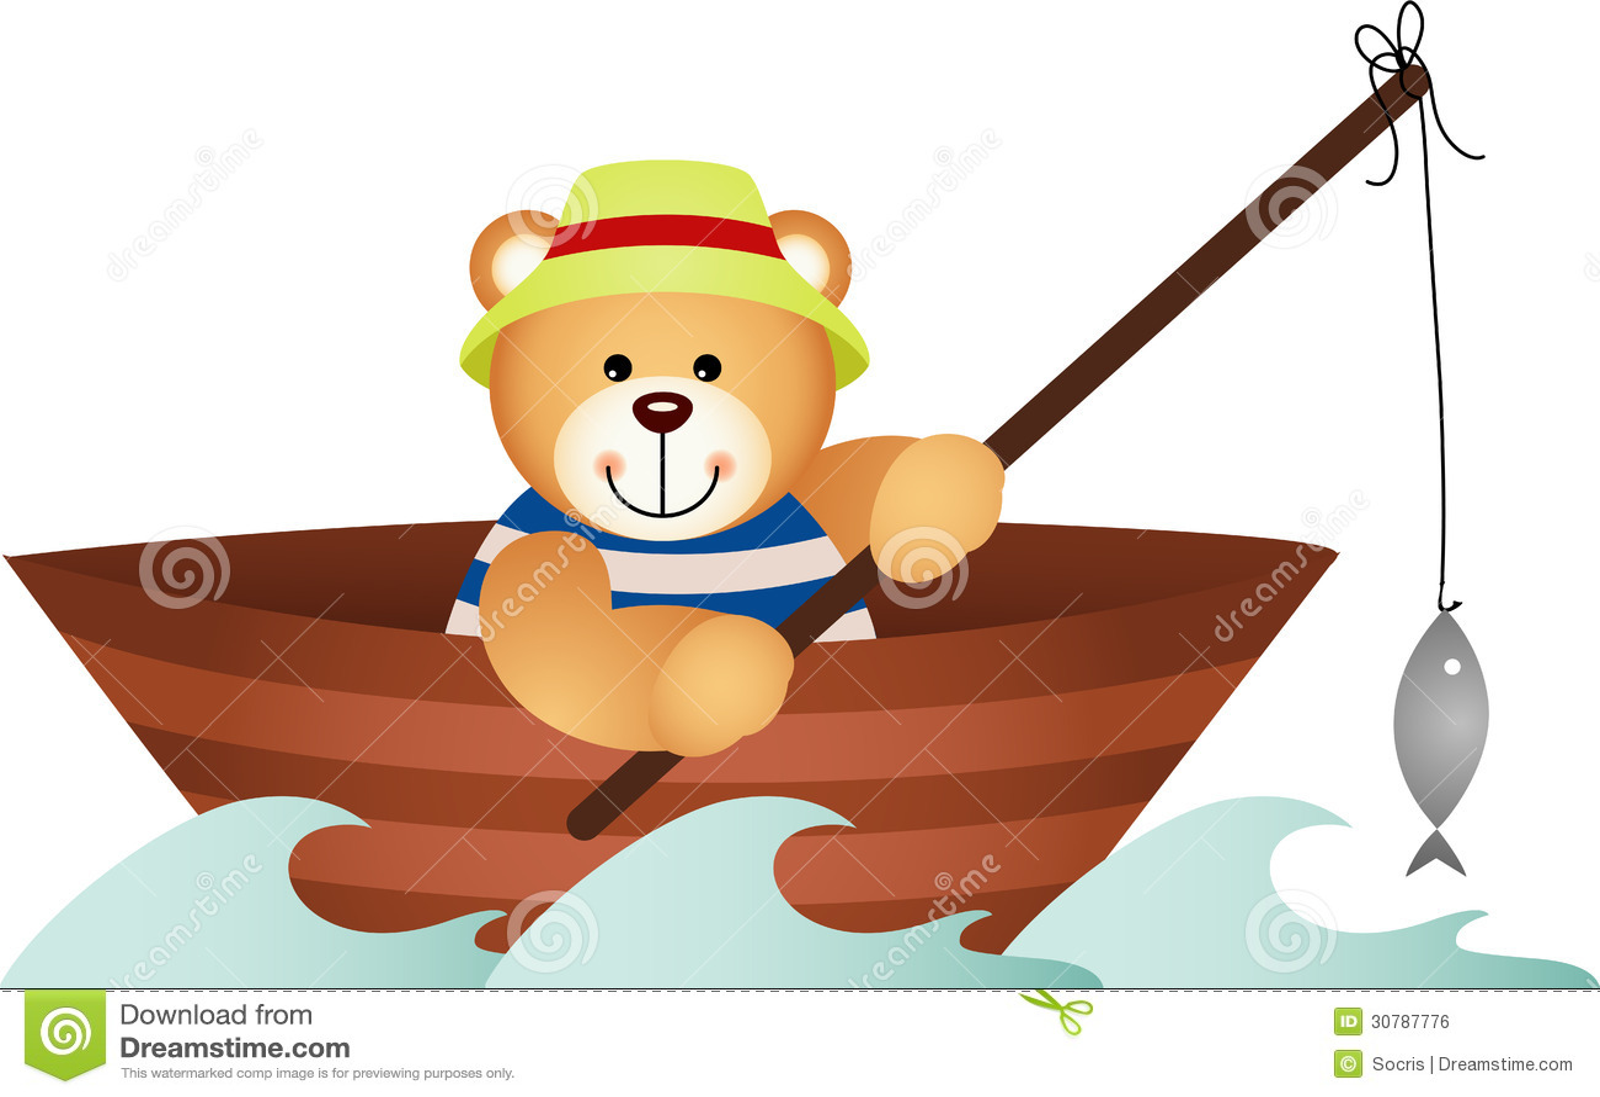 картинки медведь и рыбак